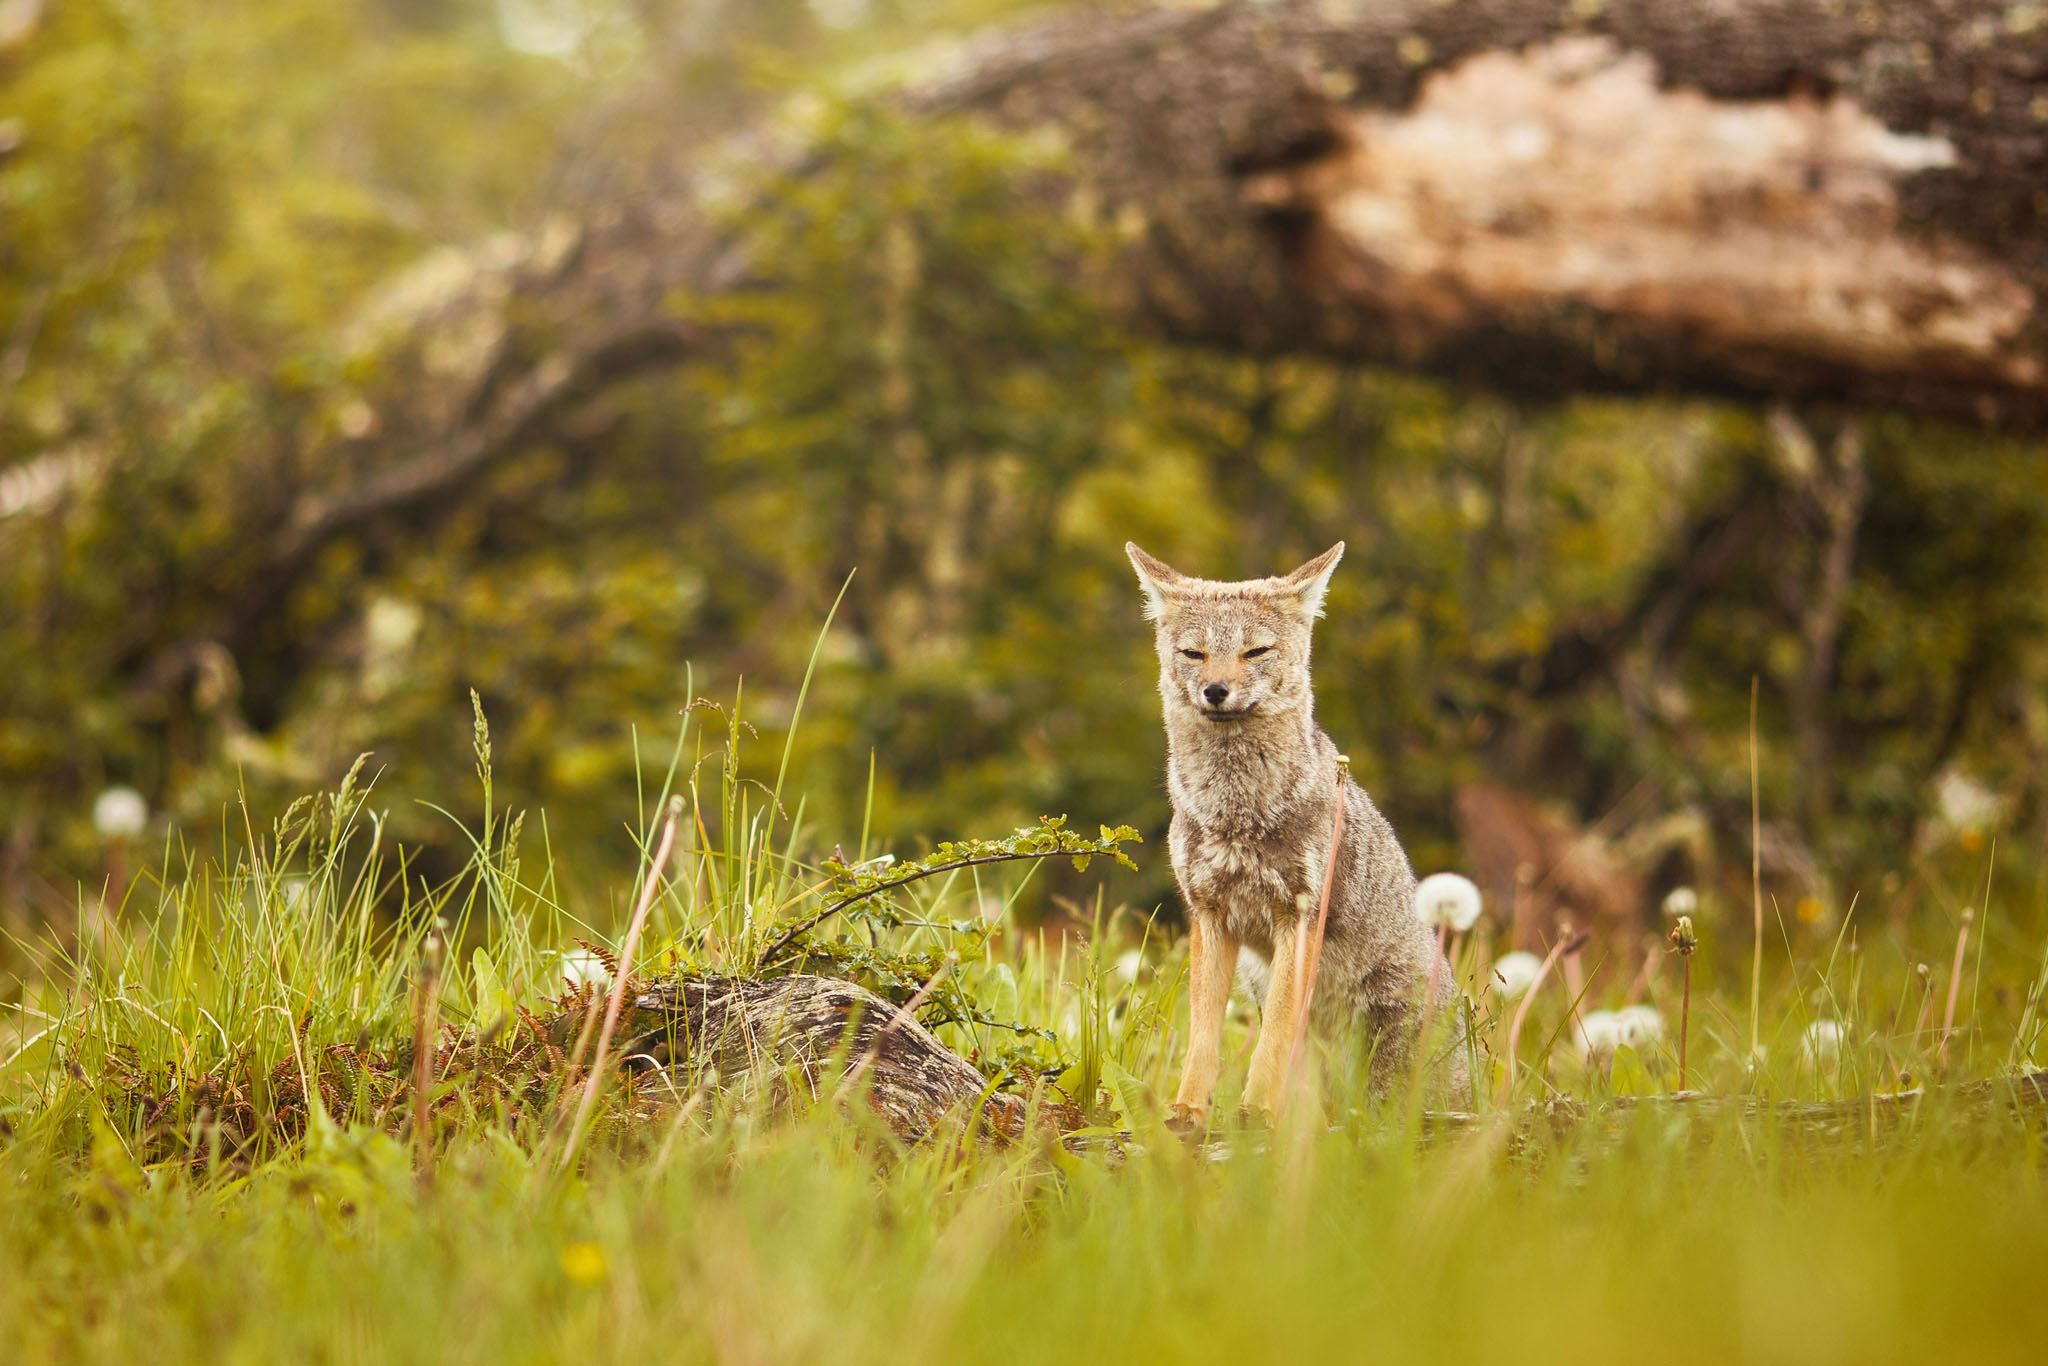 Wedding-travellers-ushuaia-argentina-fox-laguna-esmeralda